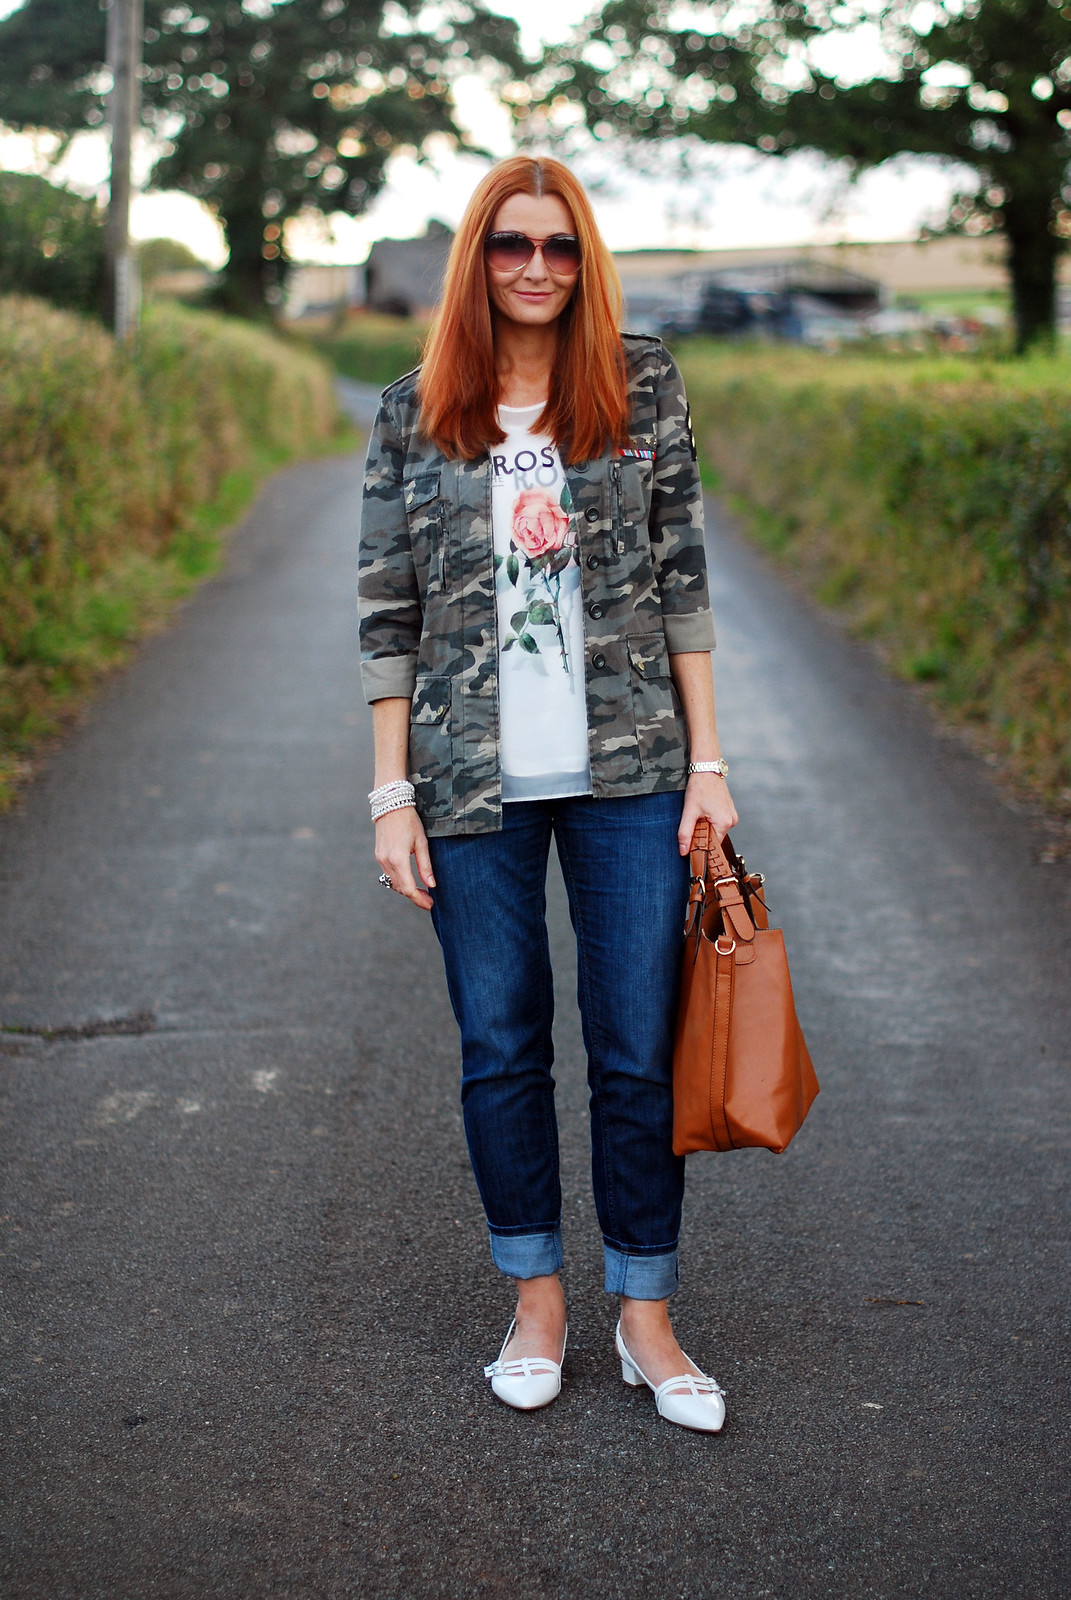 Camouflage jacket, boyfriend jeans